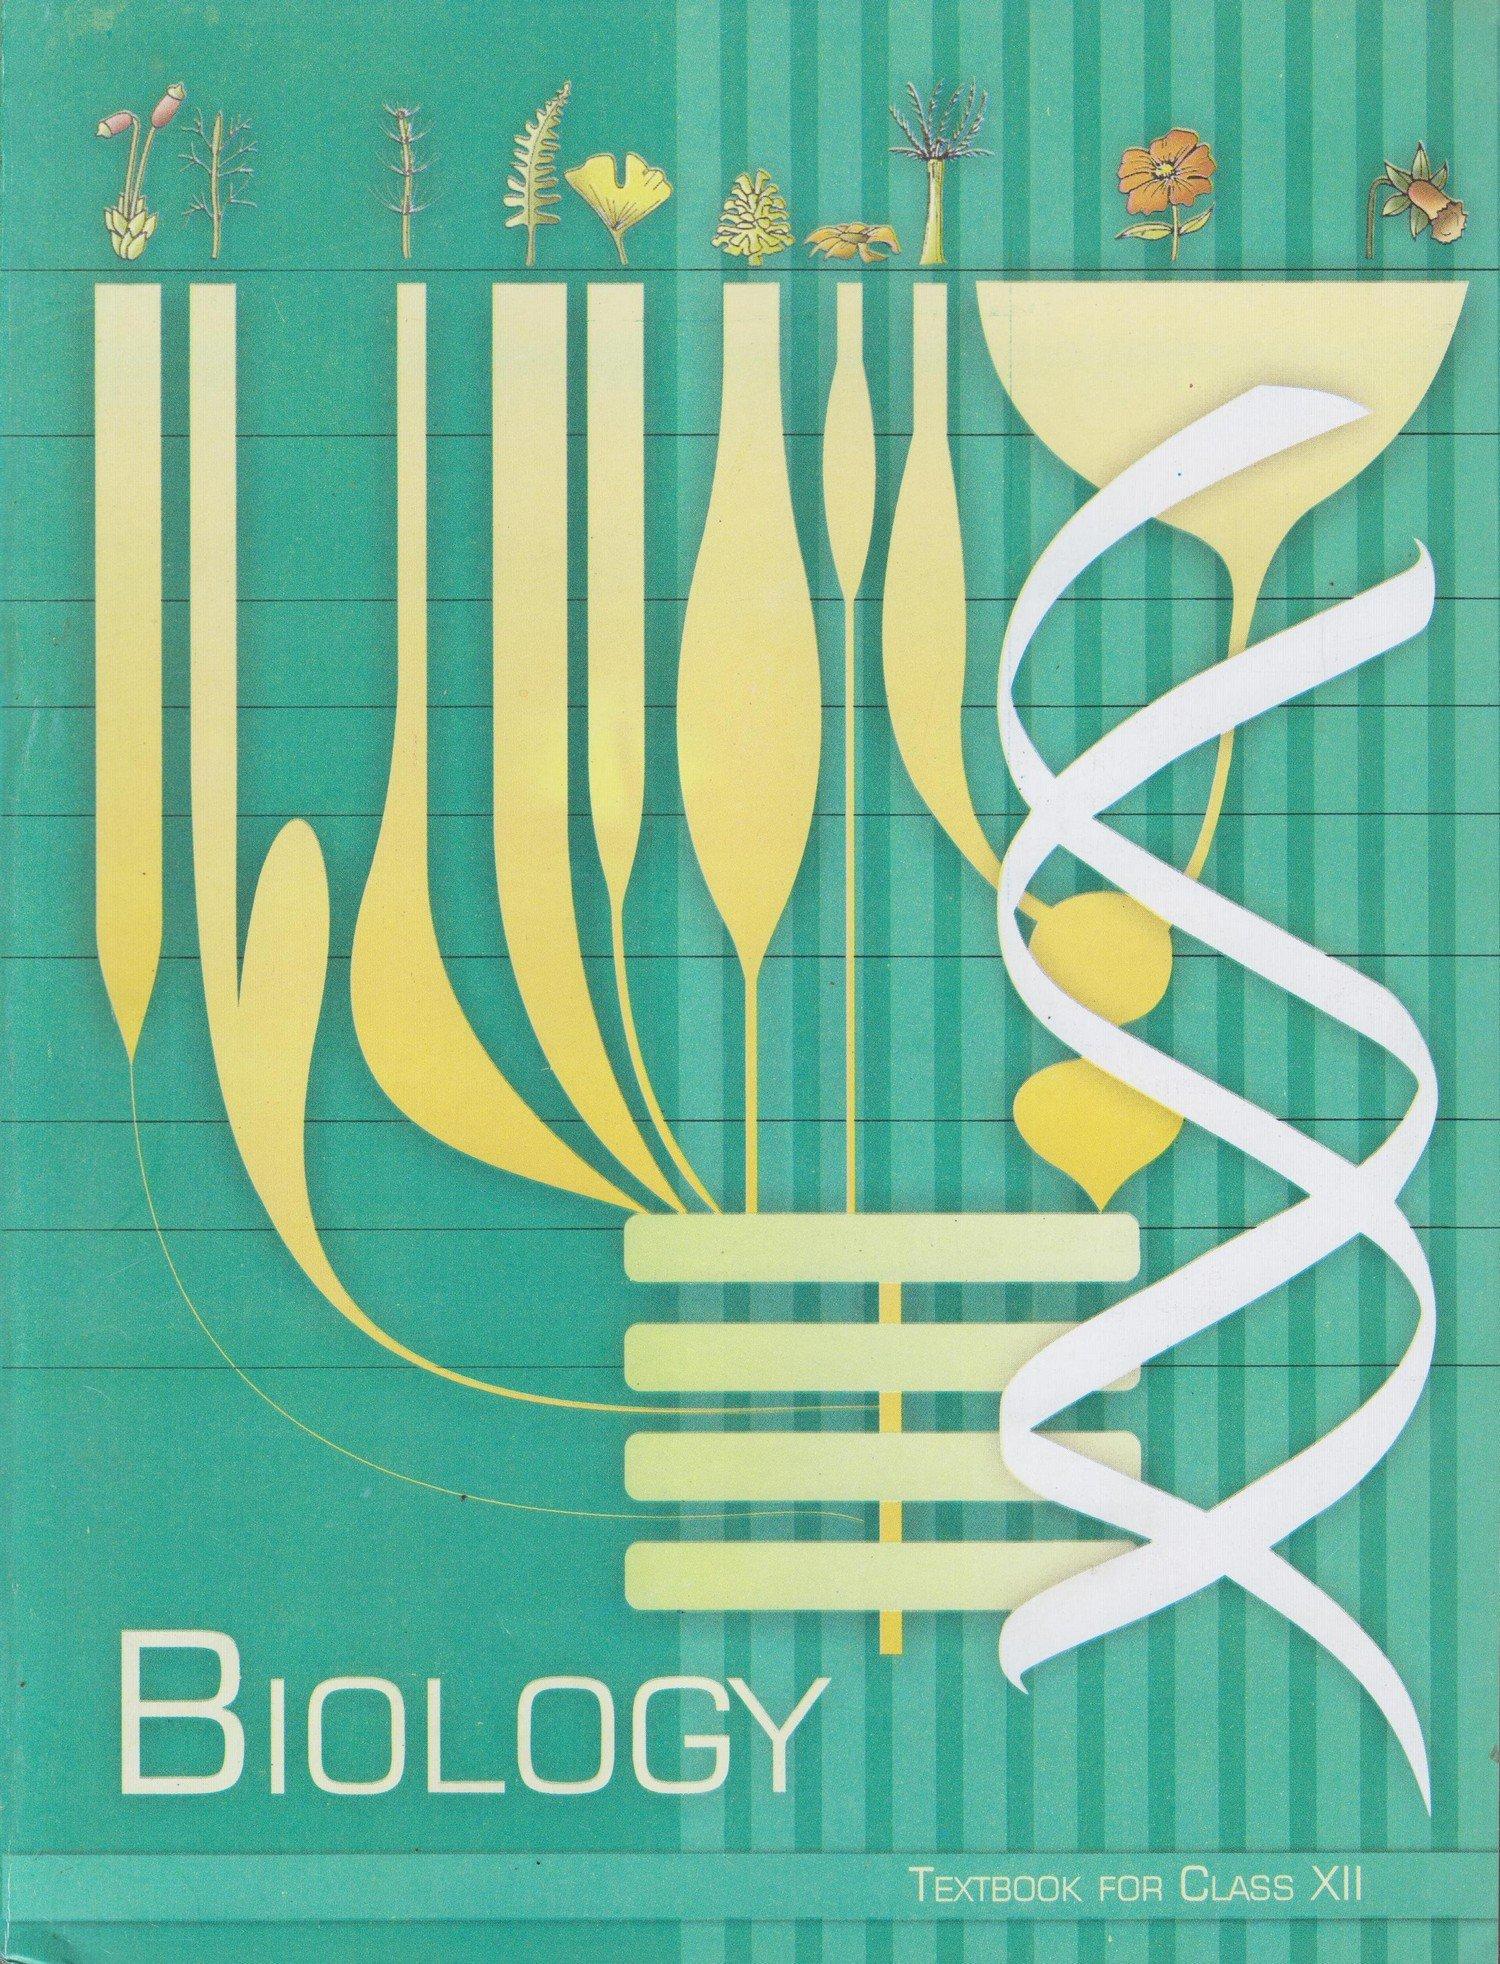 Maharashtra State Board 11th Biology Textbook Pdf